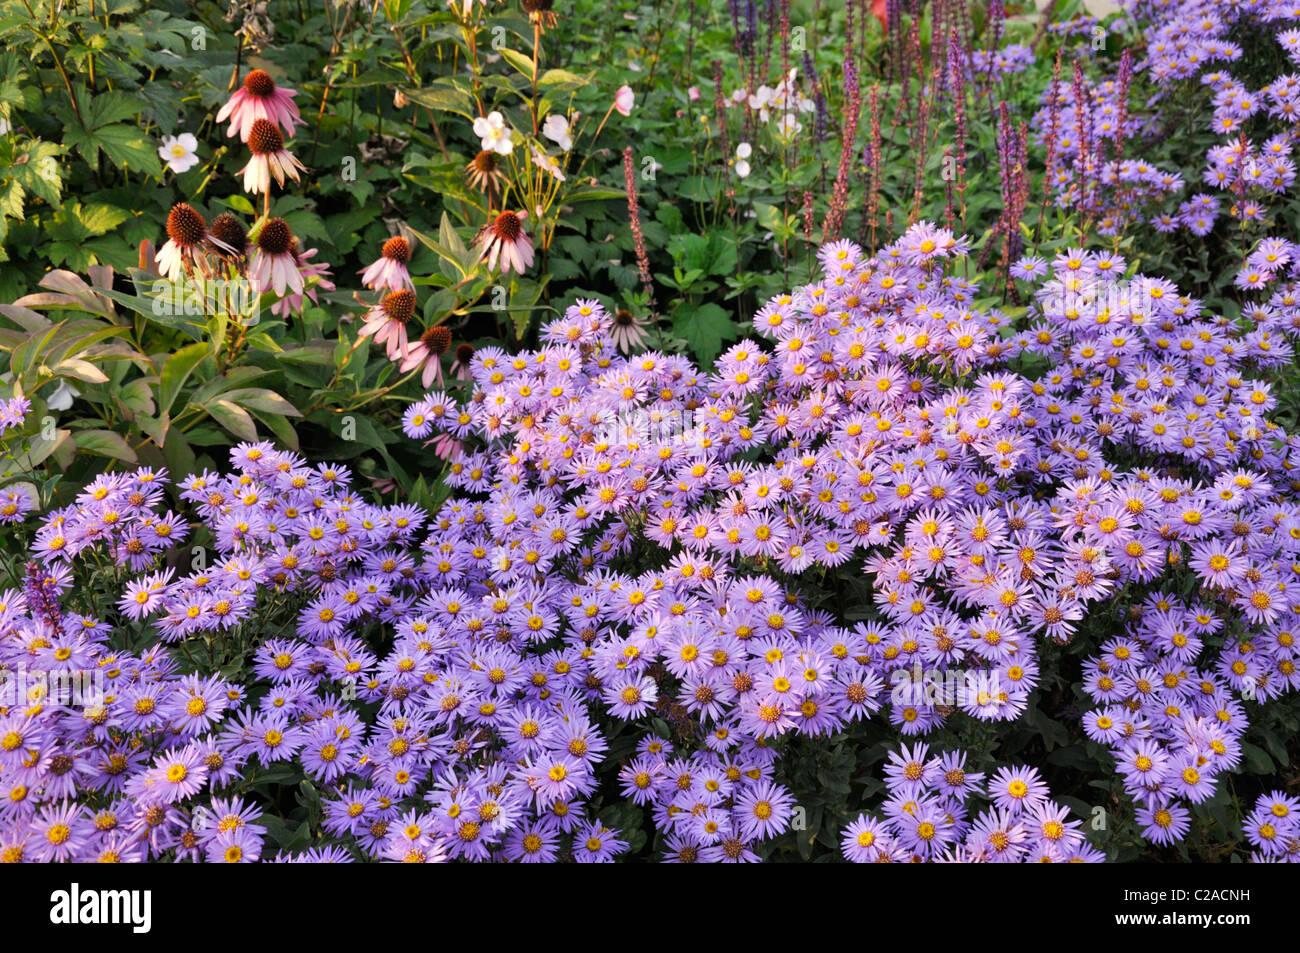 Italian aster (Aster amellus 'Glücksfund') and purple cone flower (Echinacea purpurea) - Stock Image